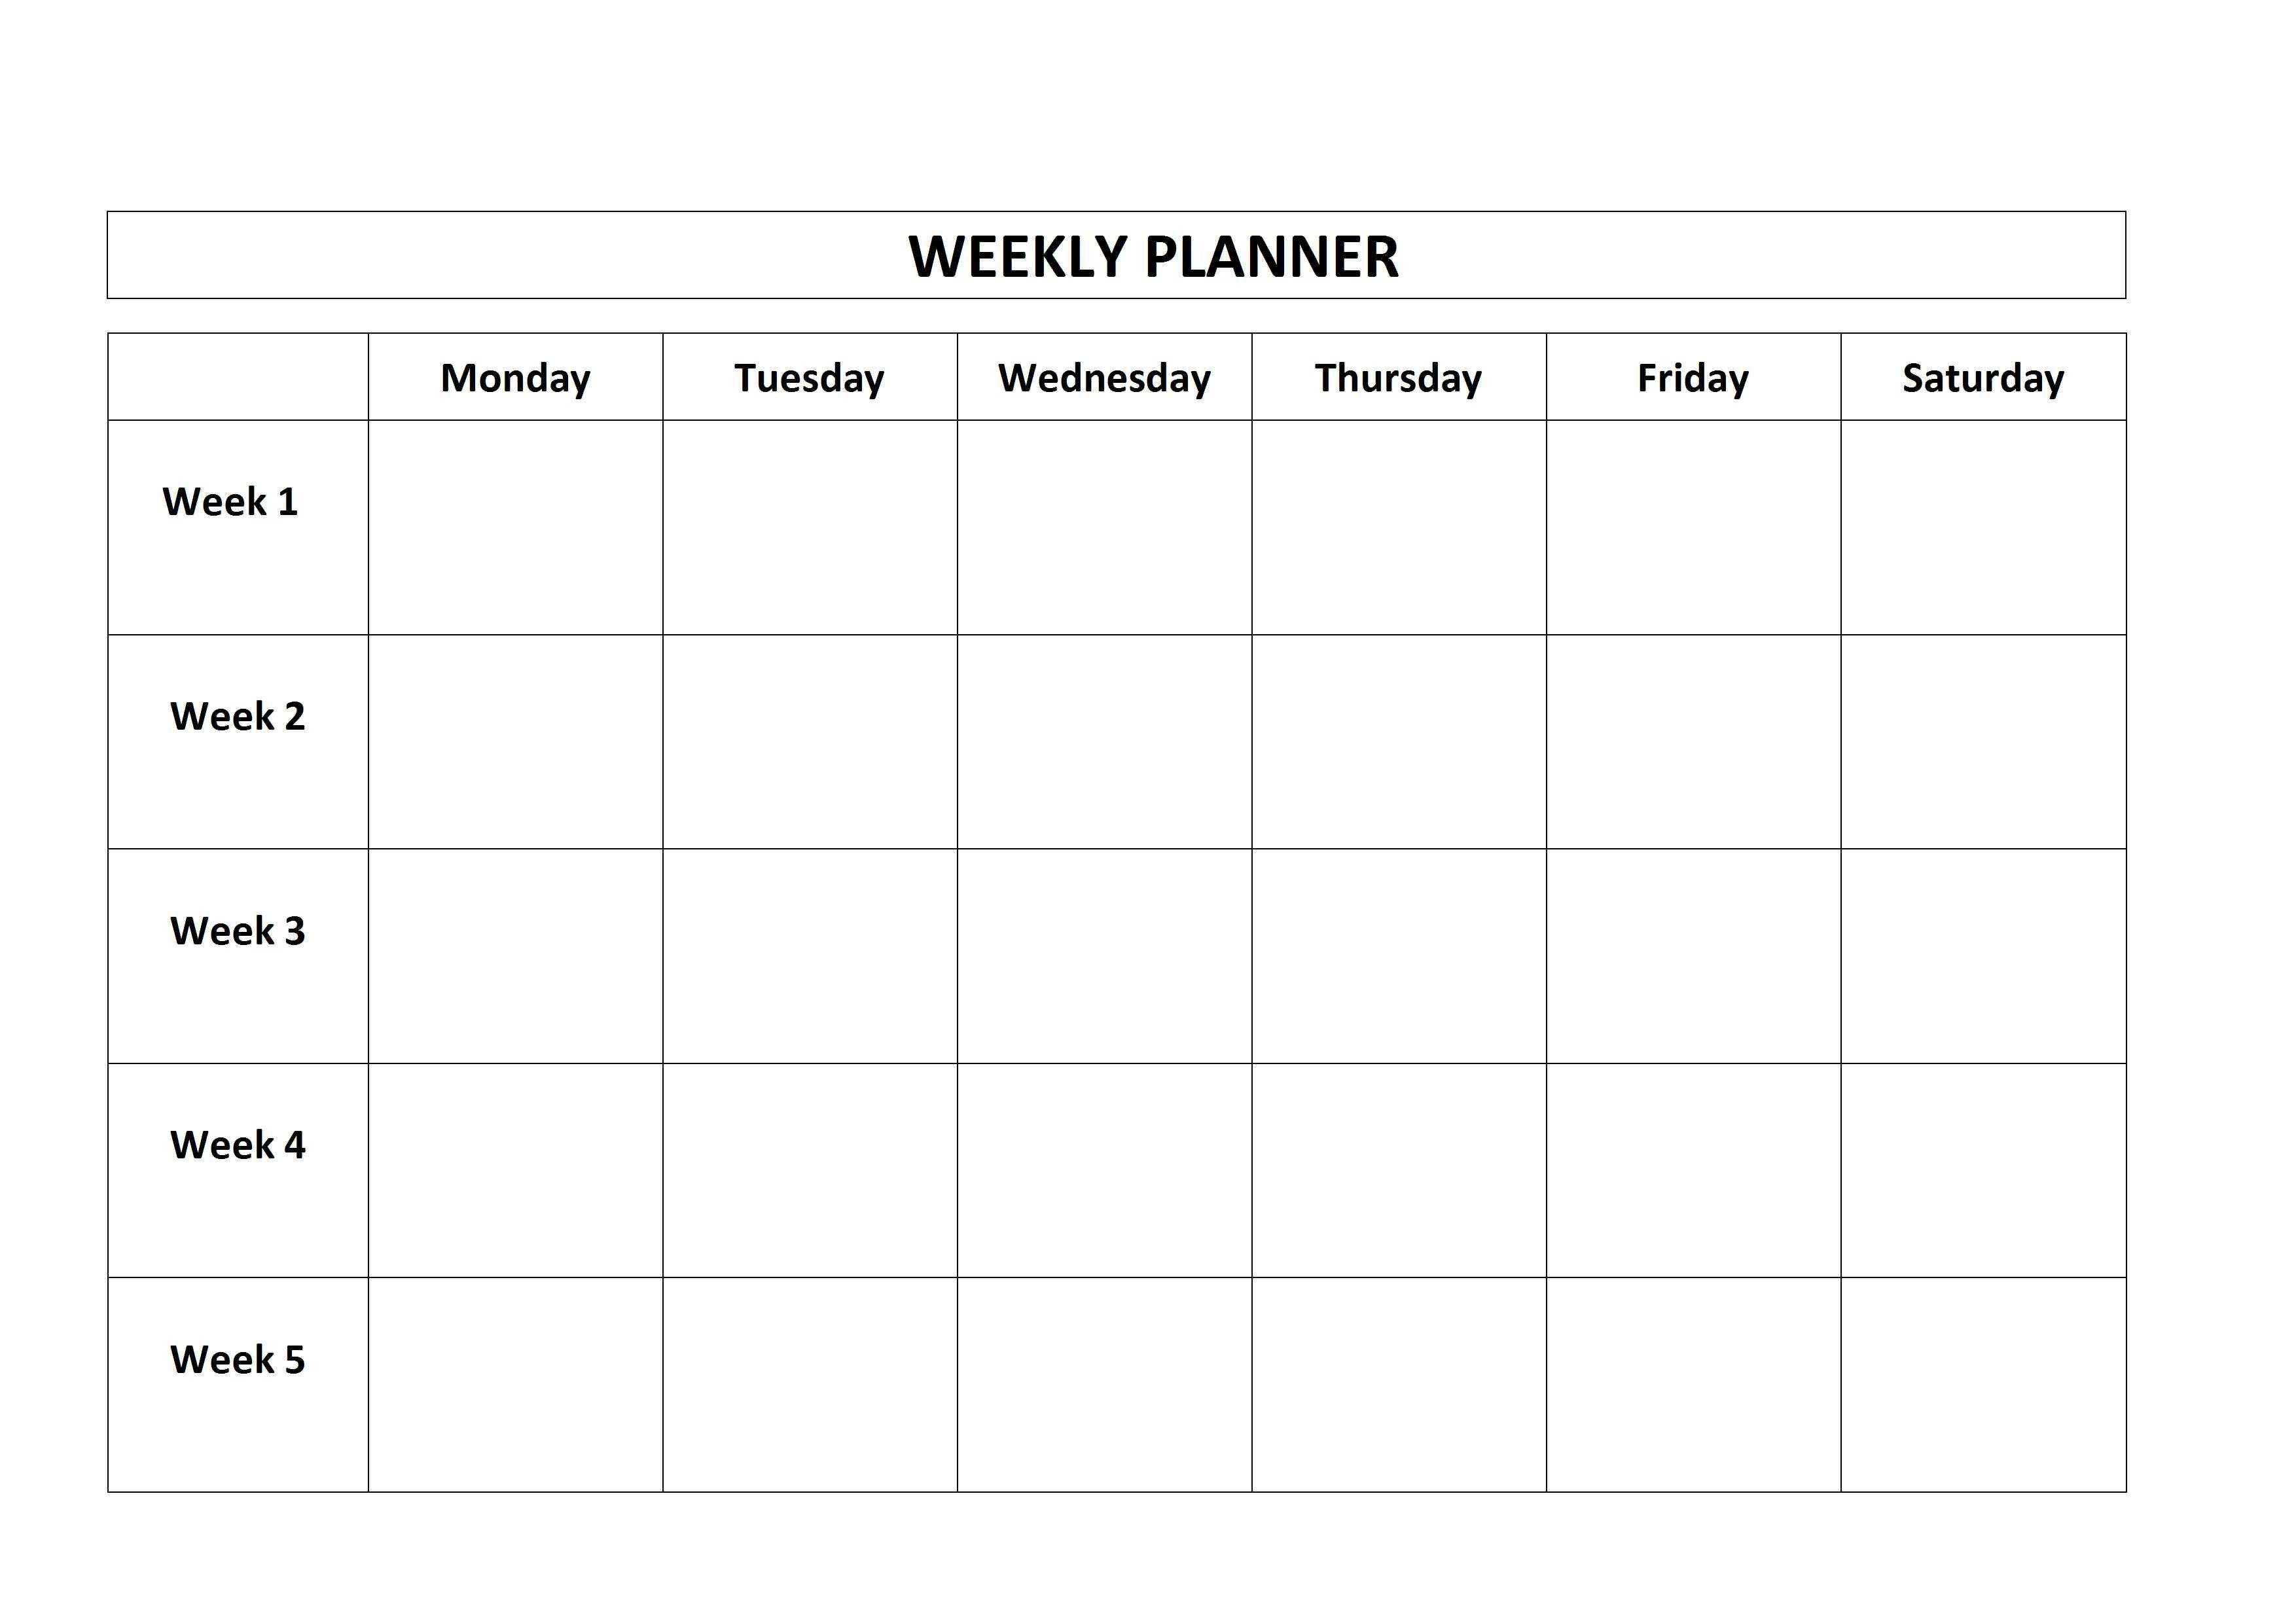 5 Day Calendar Template - Vaydile.euforic.co-Blank Calendar Template inside 5 Day Blank Calendar Template